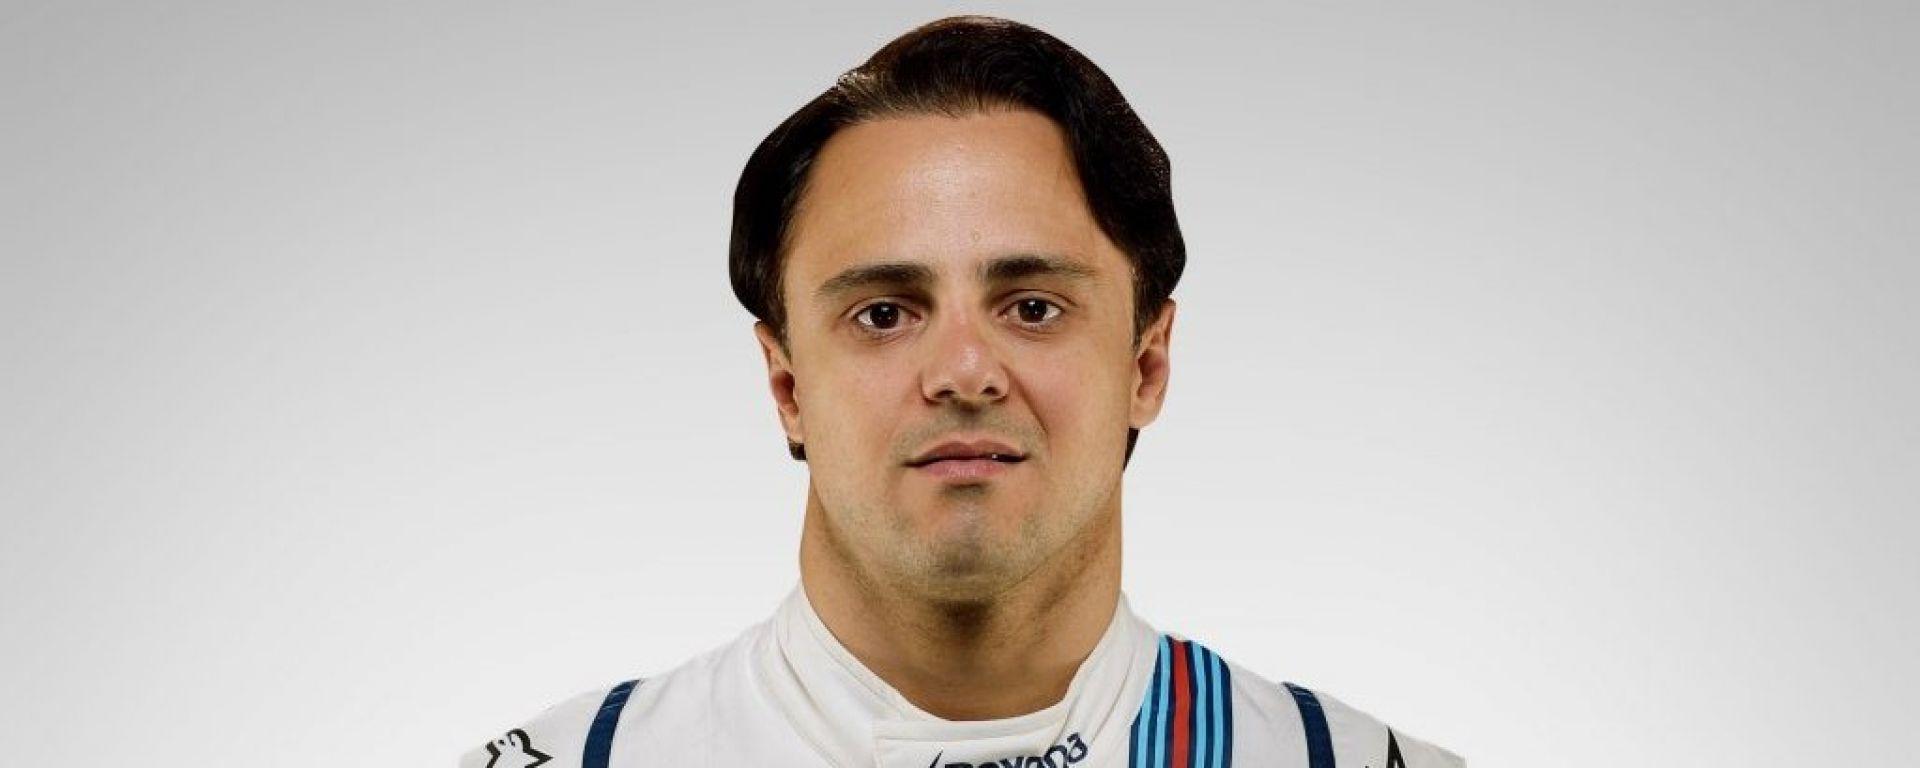 Felipe Massa #19